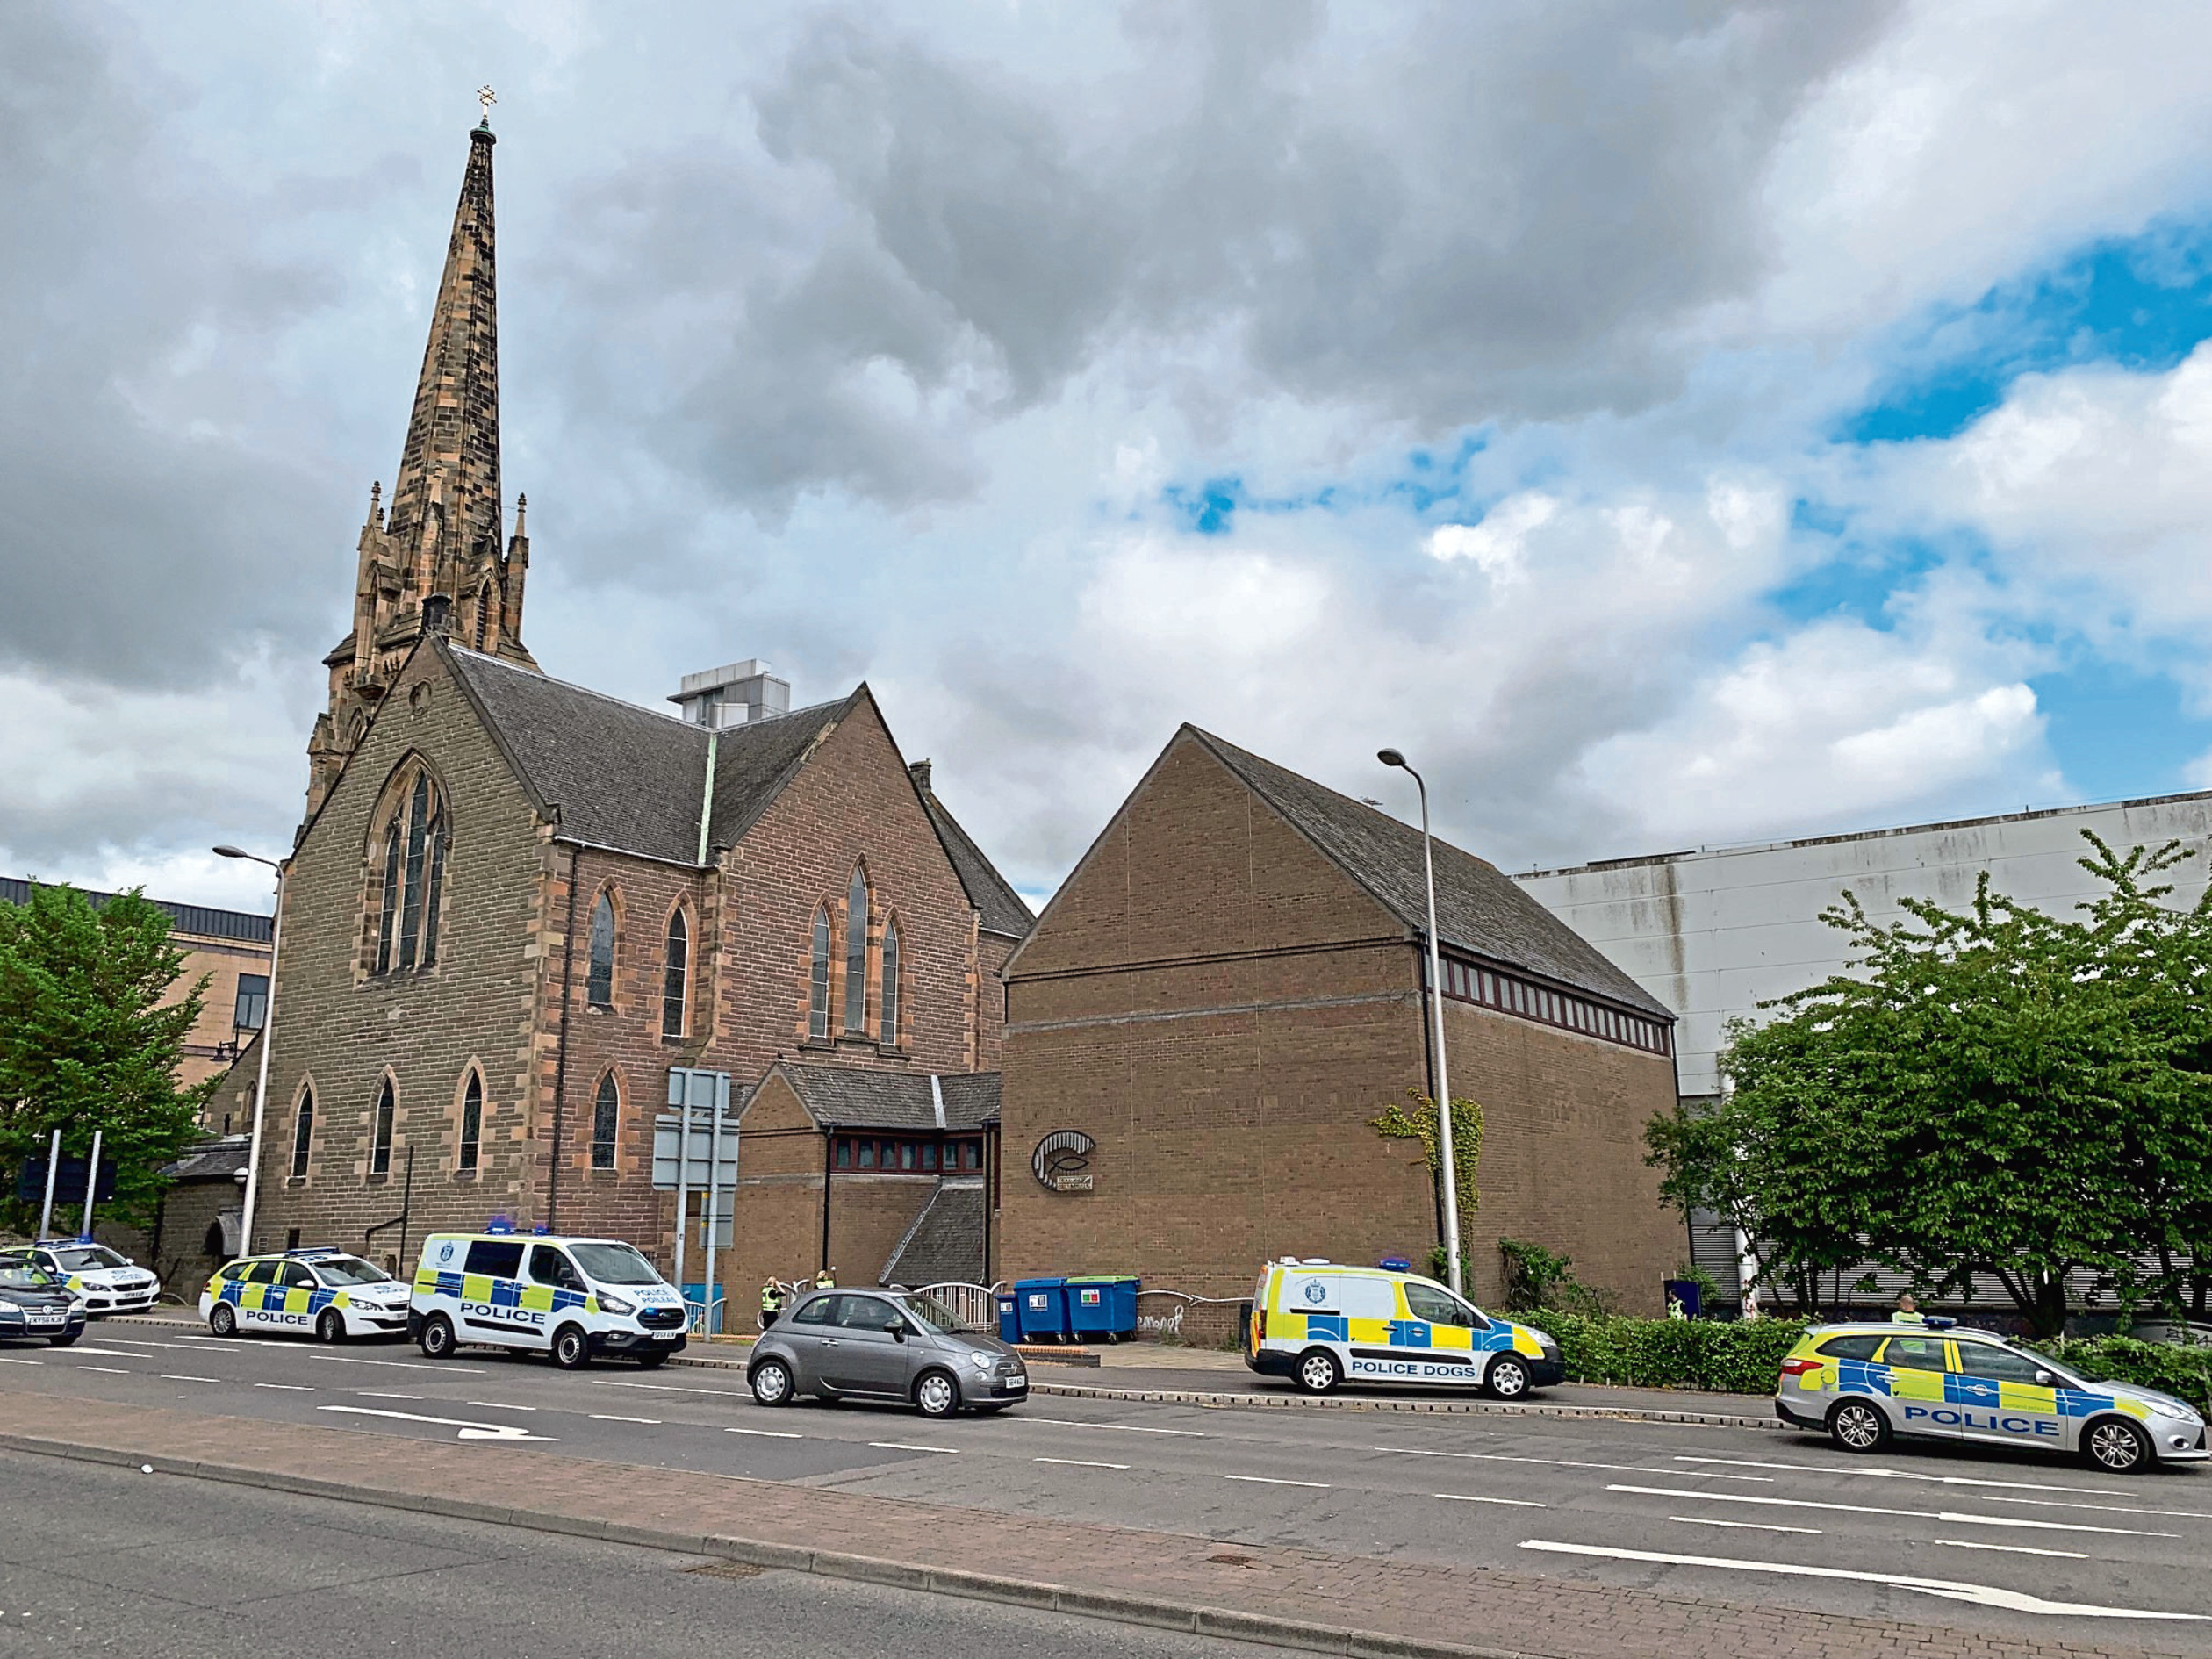 Police outside Meadowside's St Paul's Church.